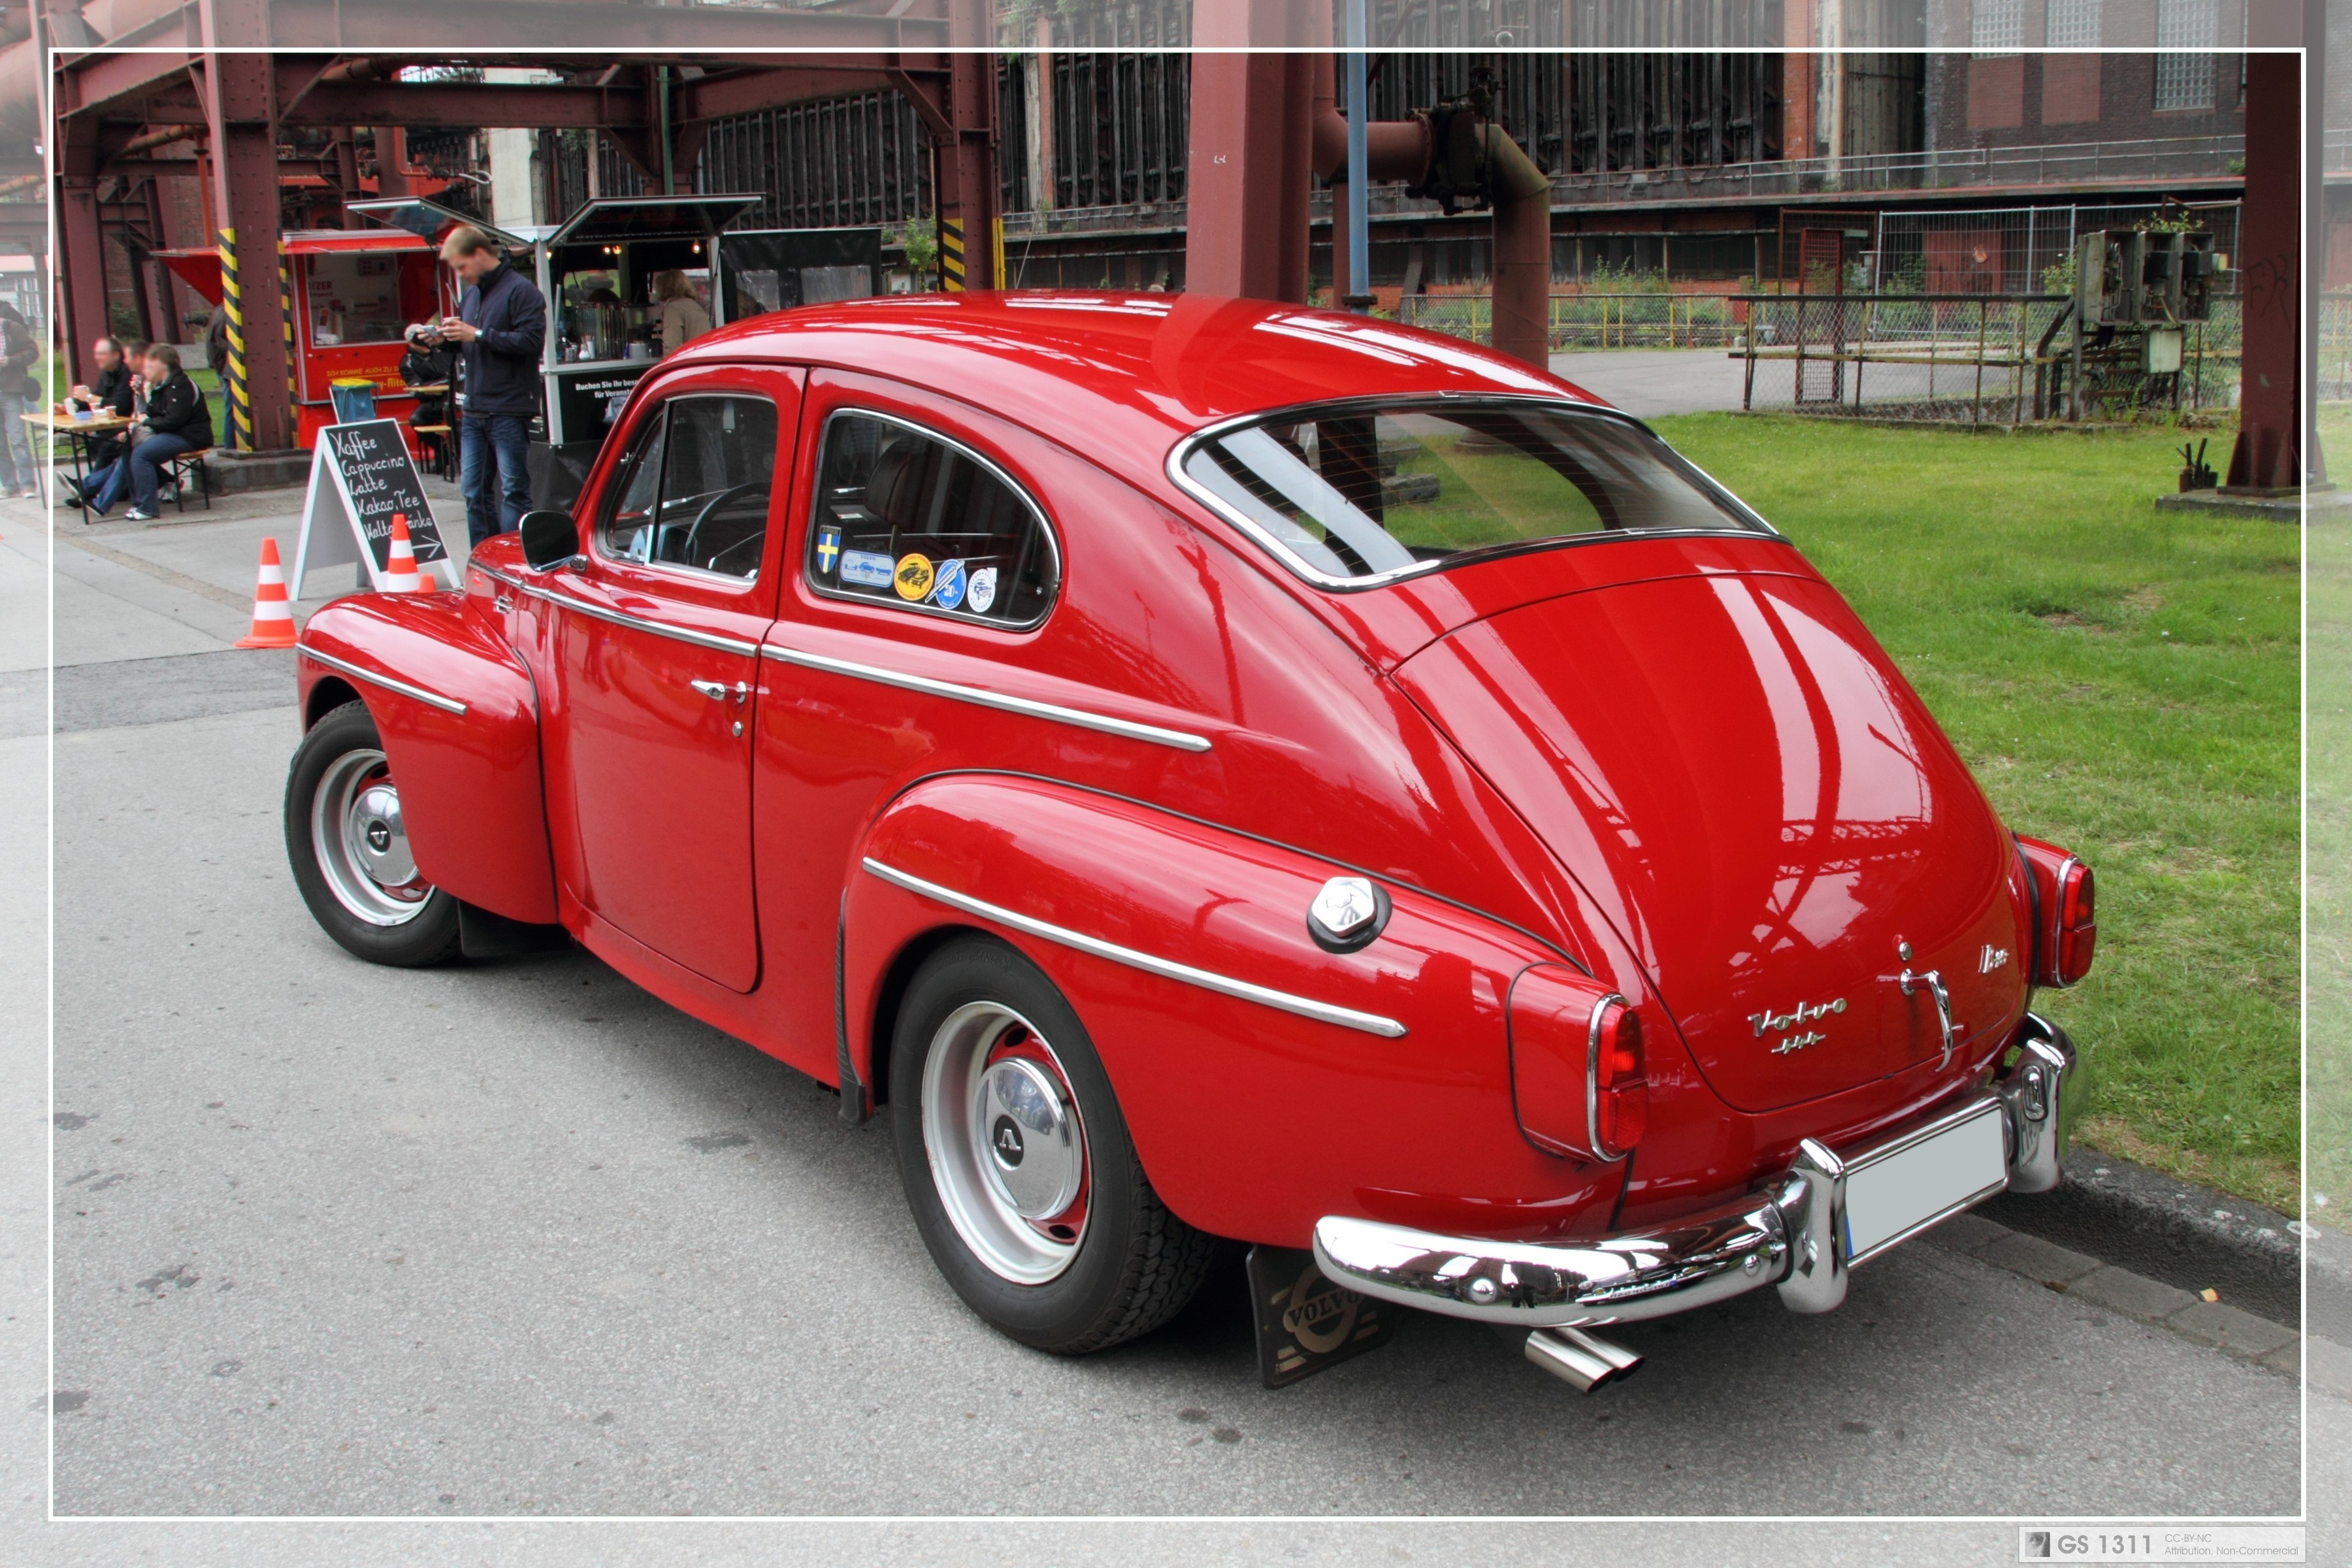 Engine And Transmission World >> 1961 Volvo PV544 (02) | Flickr - Photo Sharing!